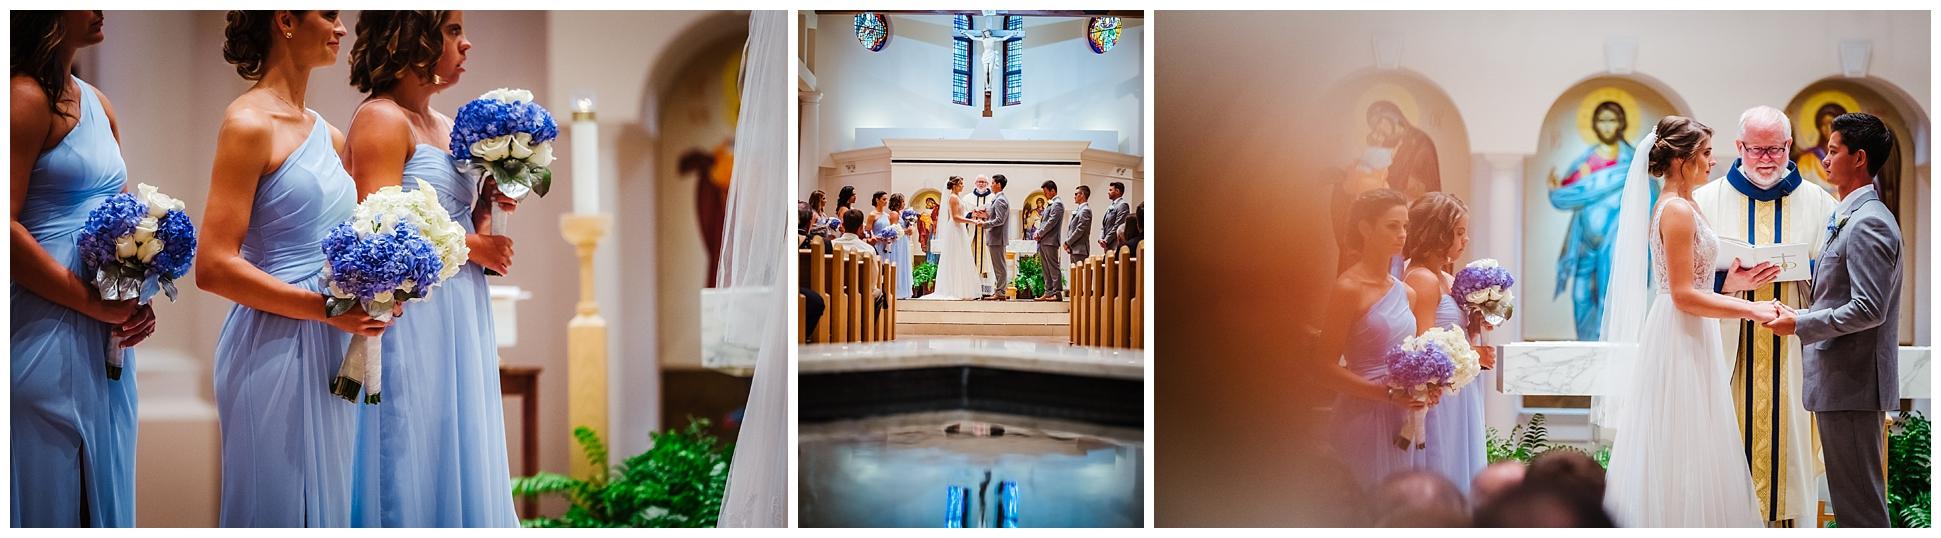 mahaffey-theater-big-military-wedding-st-pete-photographer-blue_0036.jpg